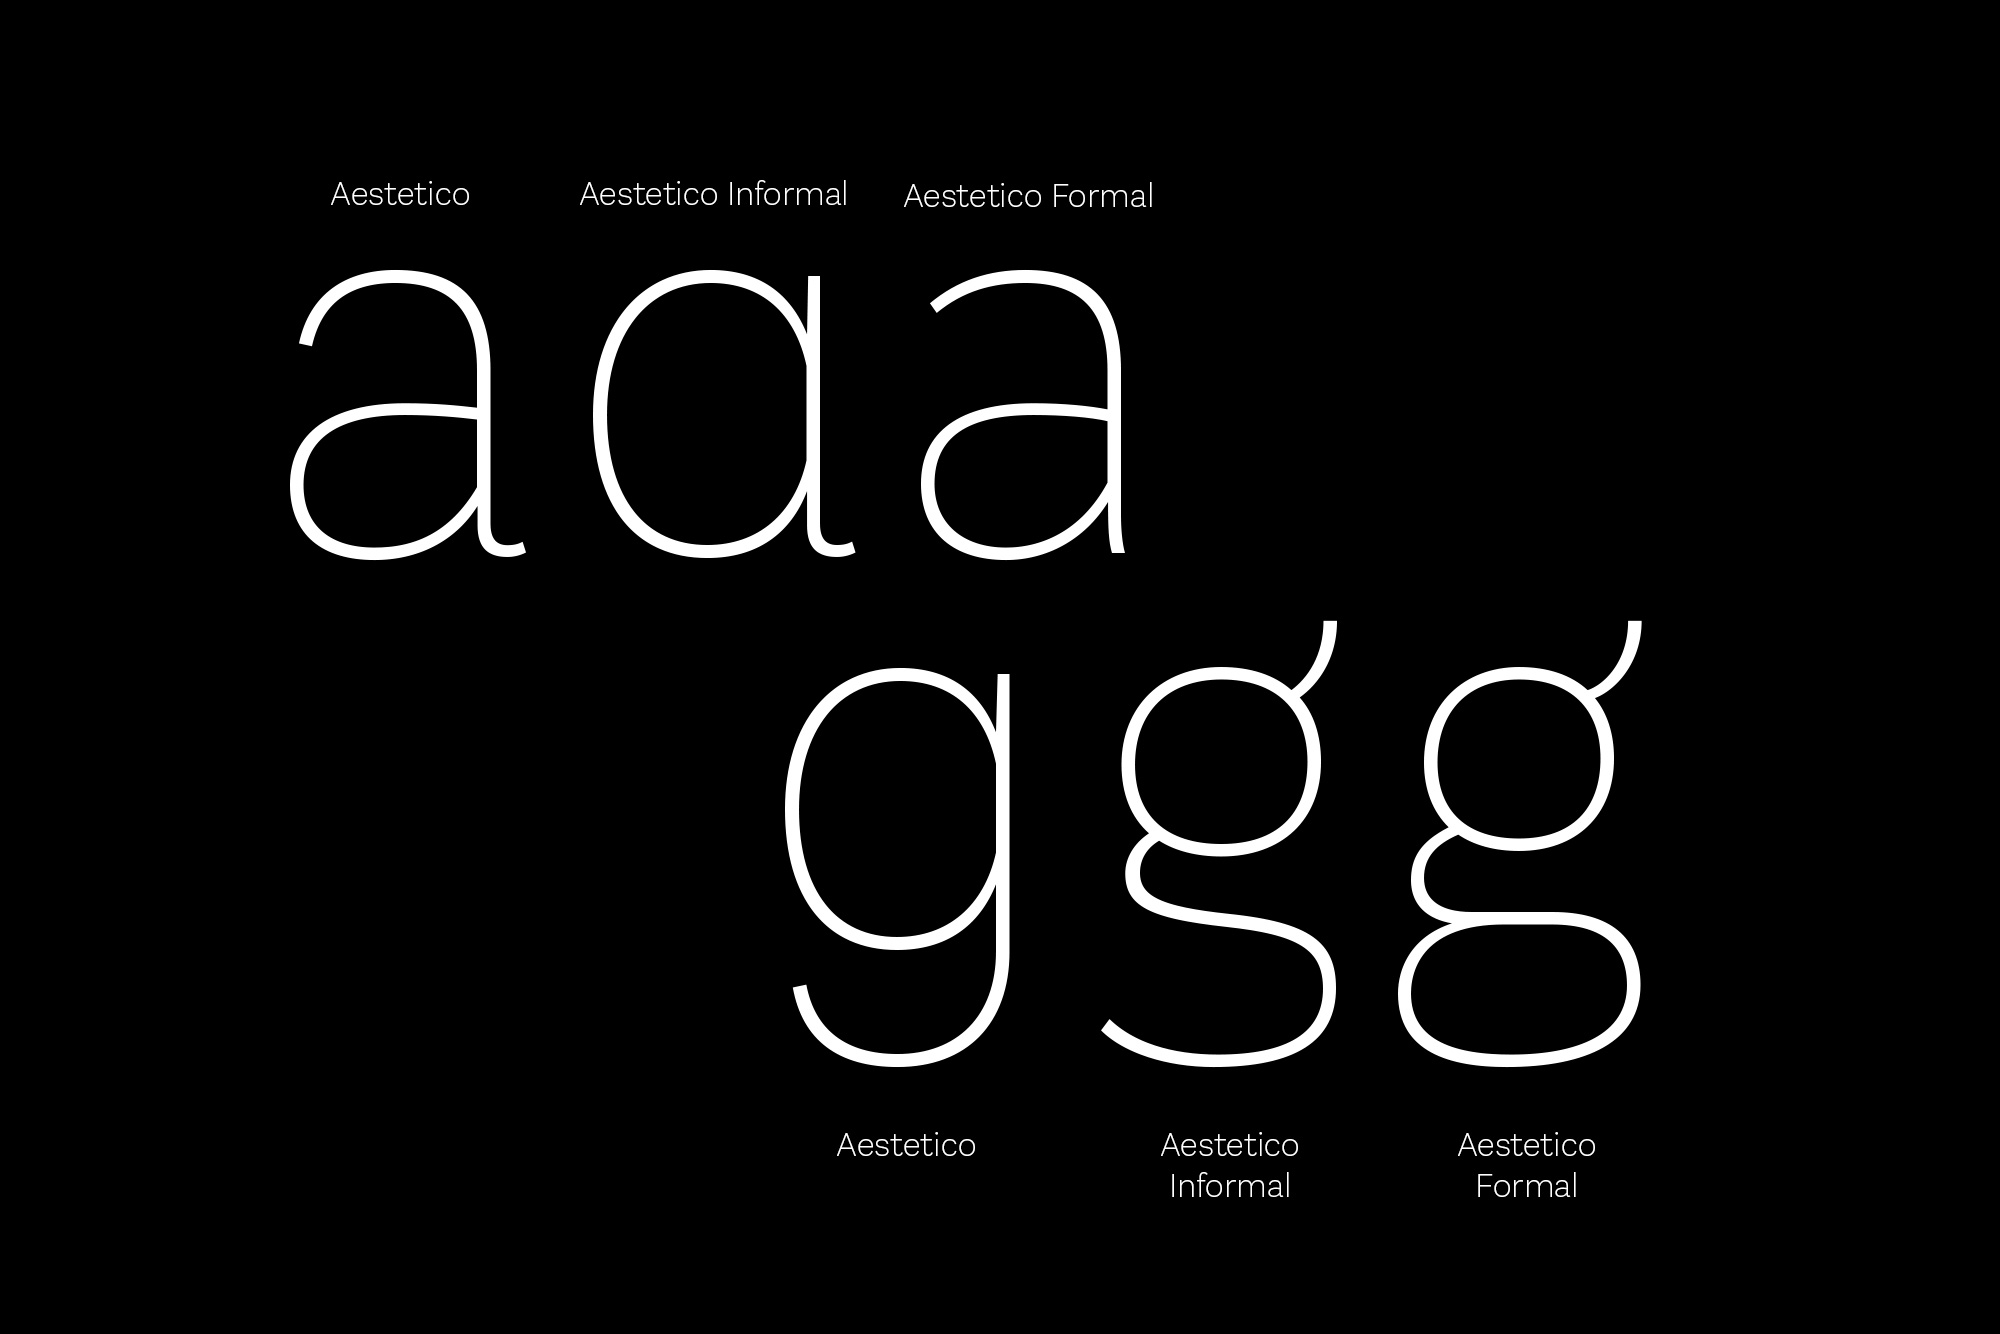 Aestetico: A Modern Take On A Classic Sans Serif